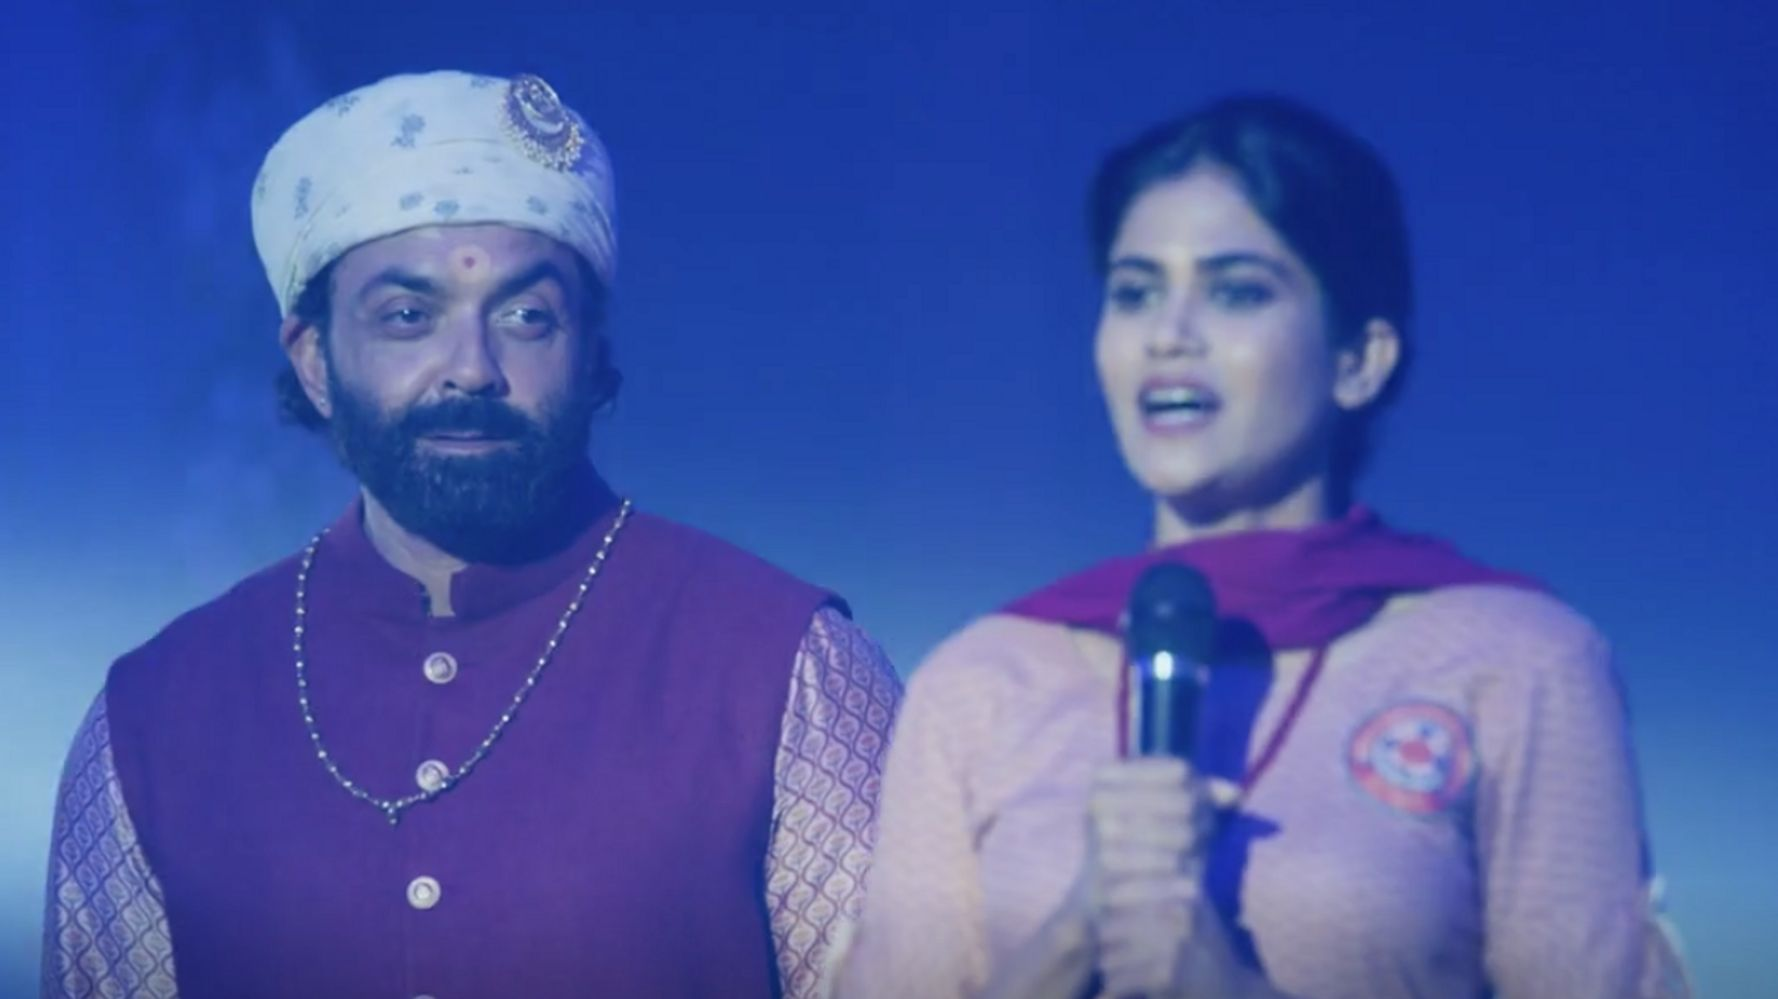 Bobby Deol's 'Aashram' Is Tacky, But It Strikes At The Hindutva Hornet's Nest